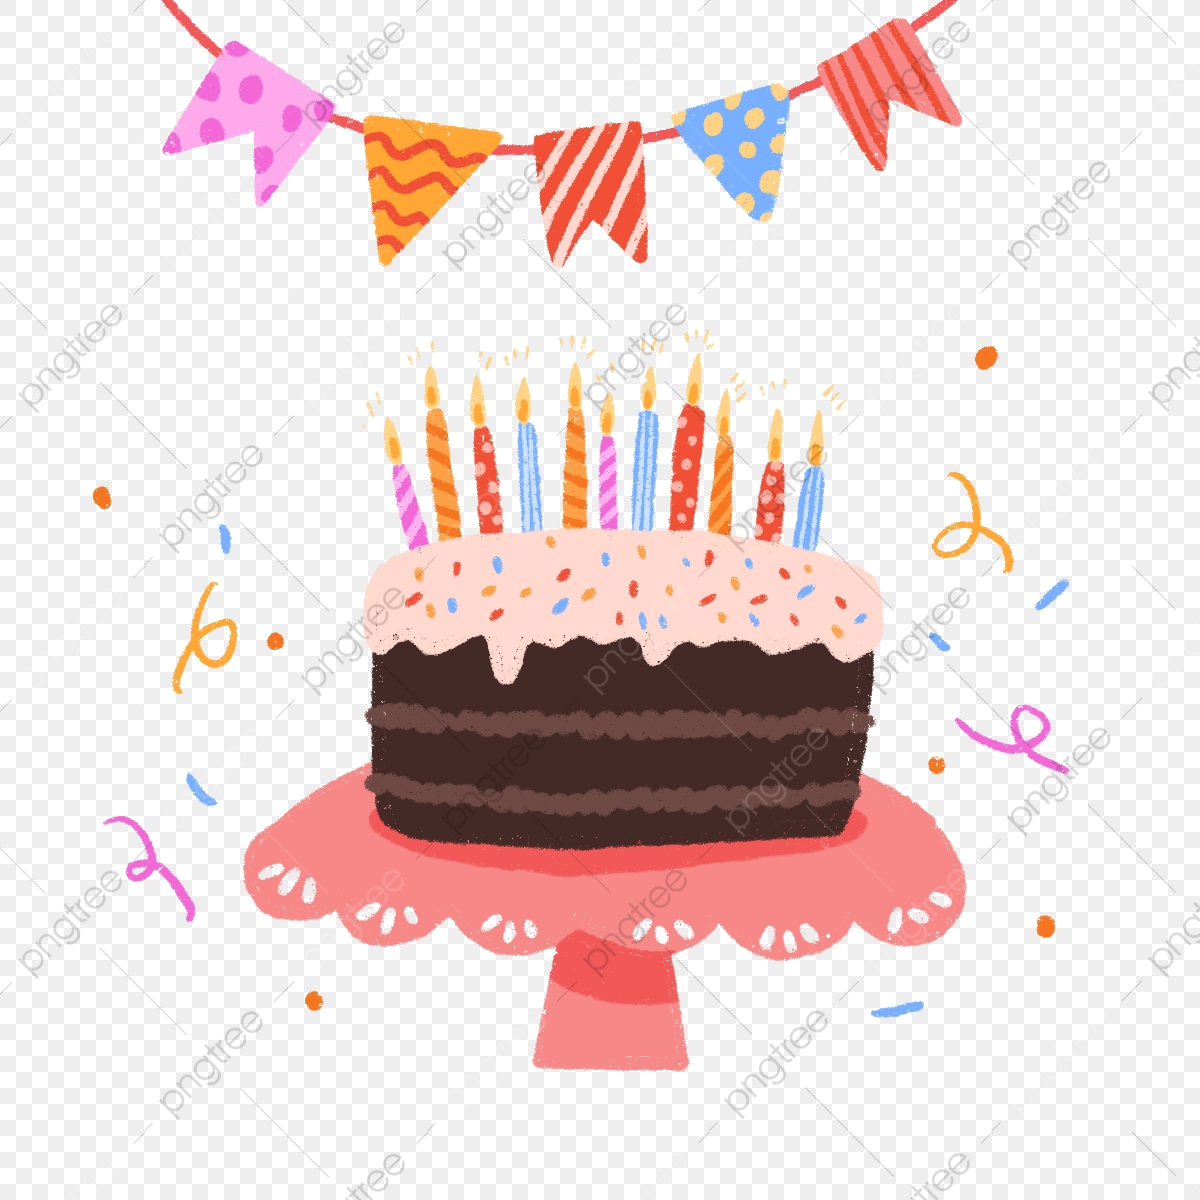 Admirable Hand Draw Cute Birthday Cake Hand Drawn Cute Birthday Cake Png Funny Birthday Cards Online Alyptdamsfinfo